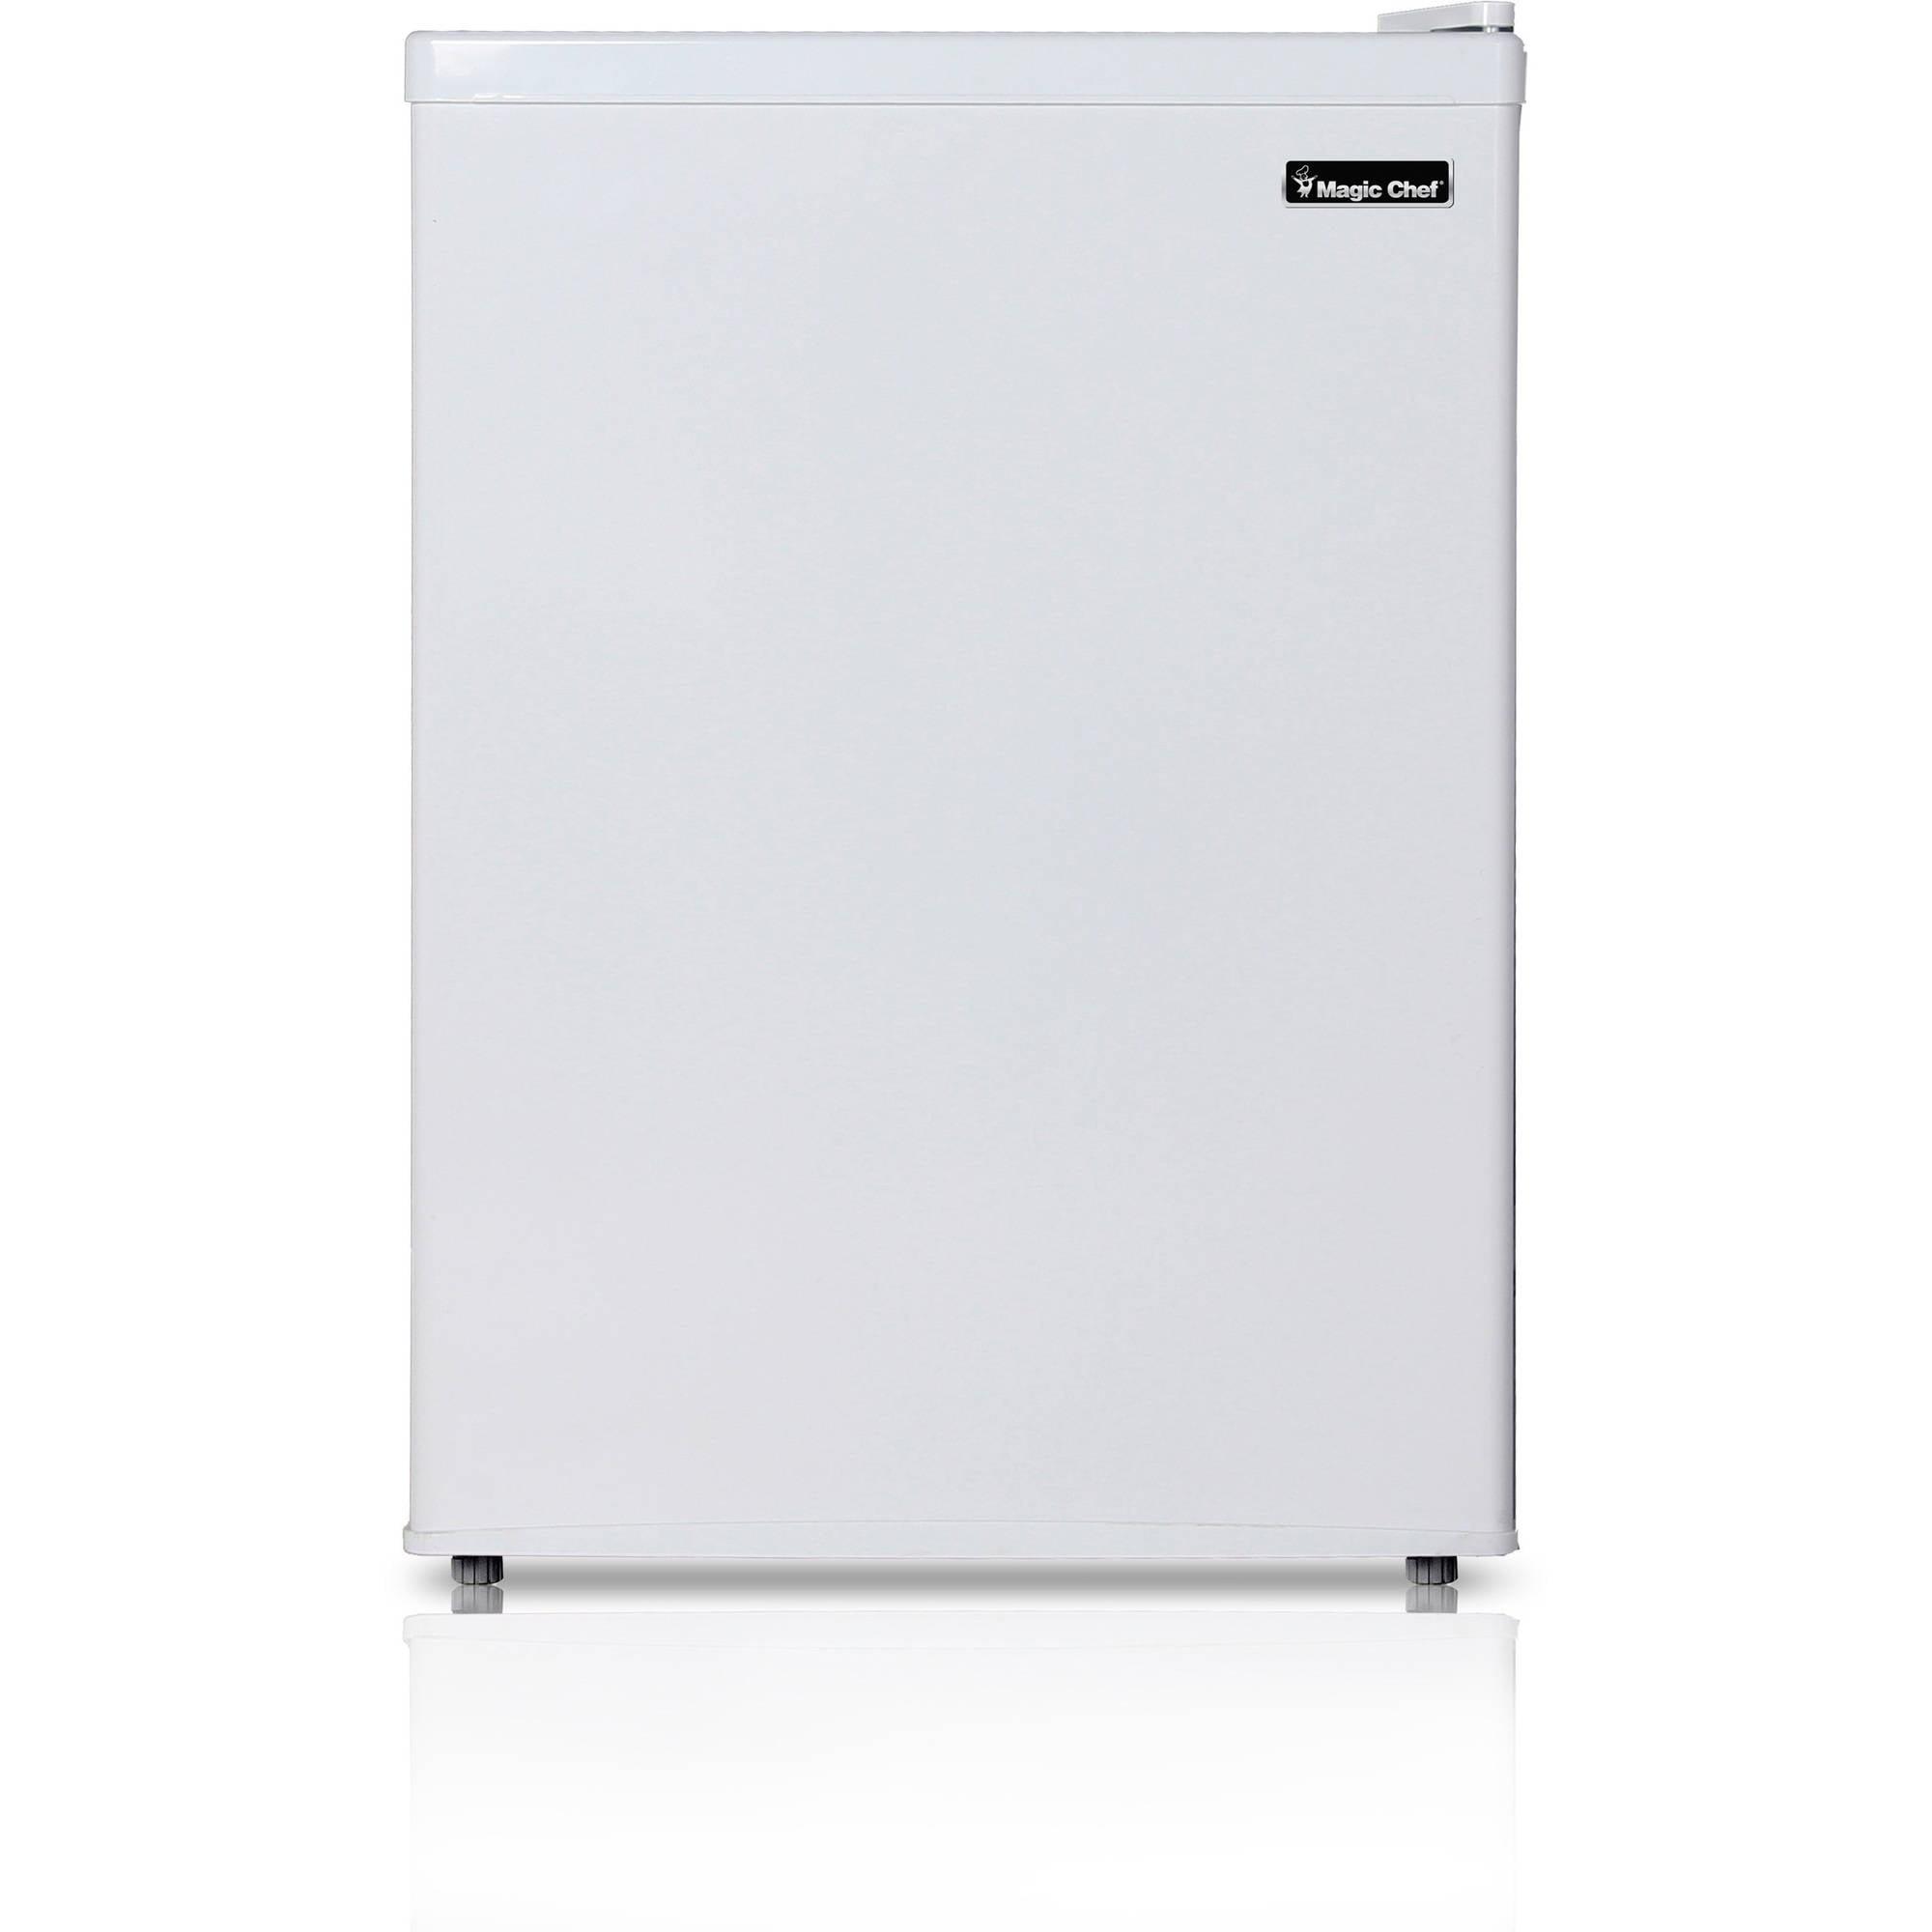 Magic Chef Kitchen Appliances Magic Chef 44 Cubic Foot Refrigerator Black Walmartcom